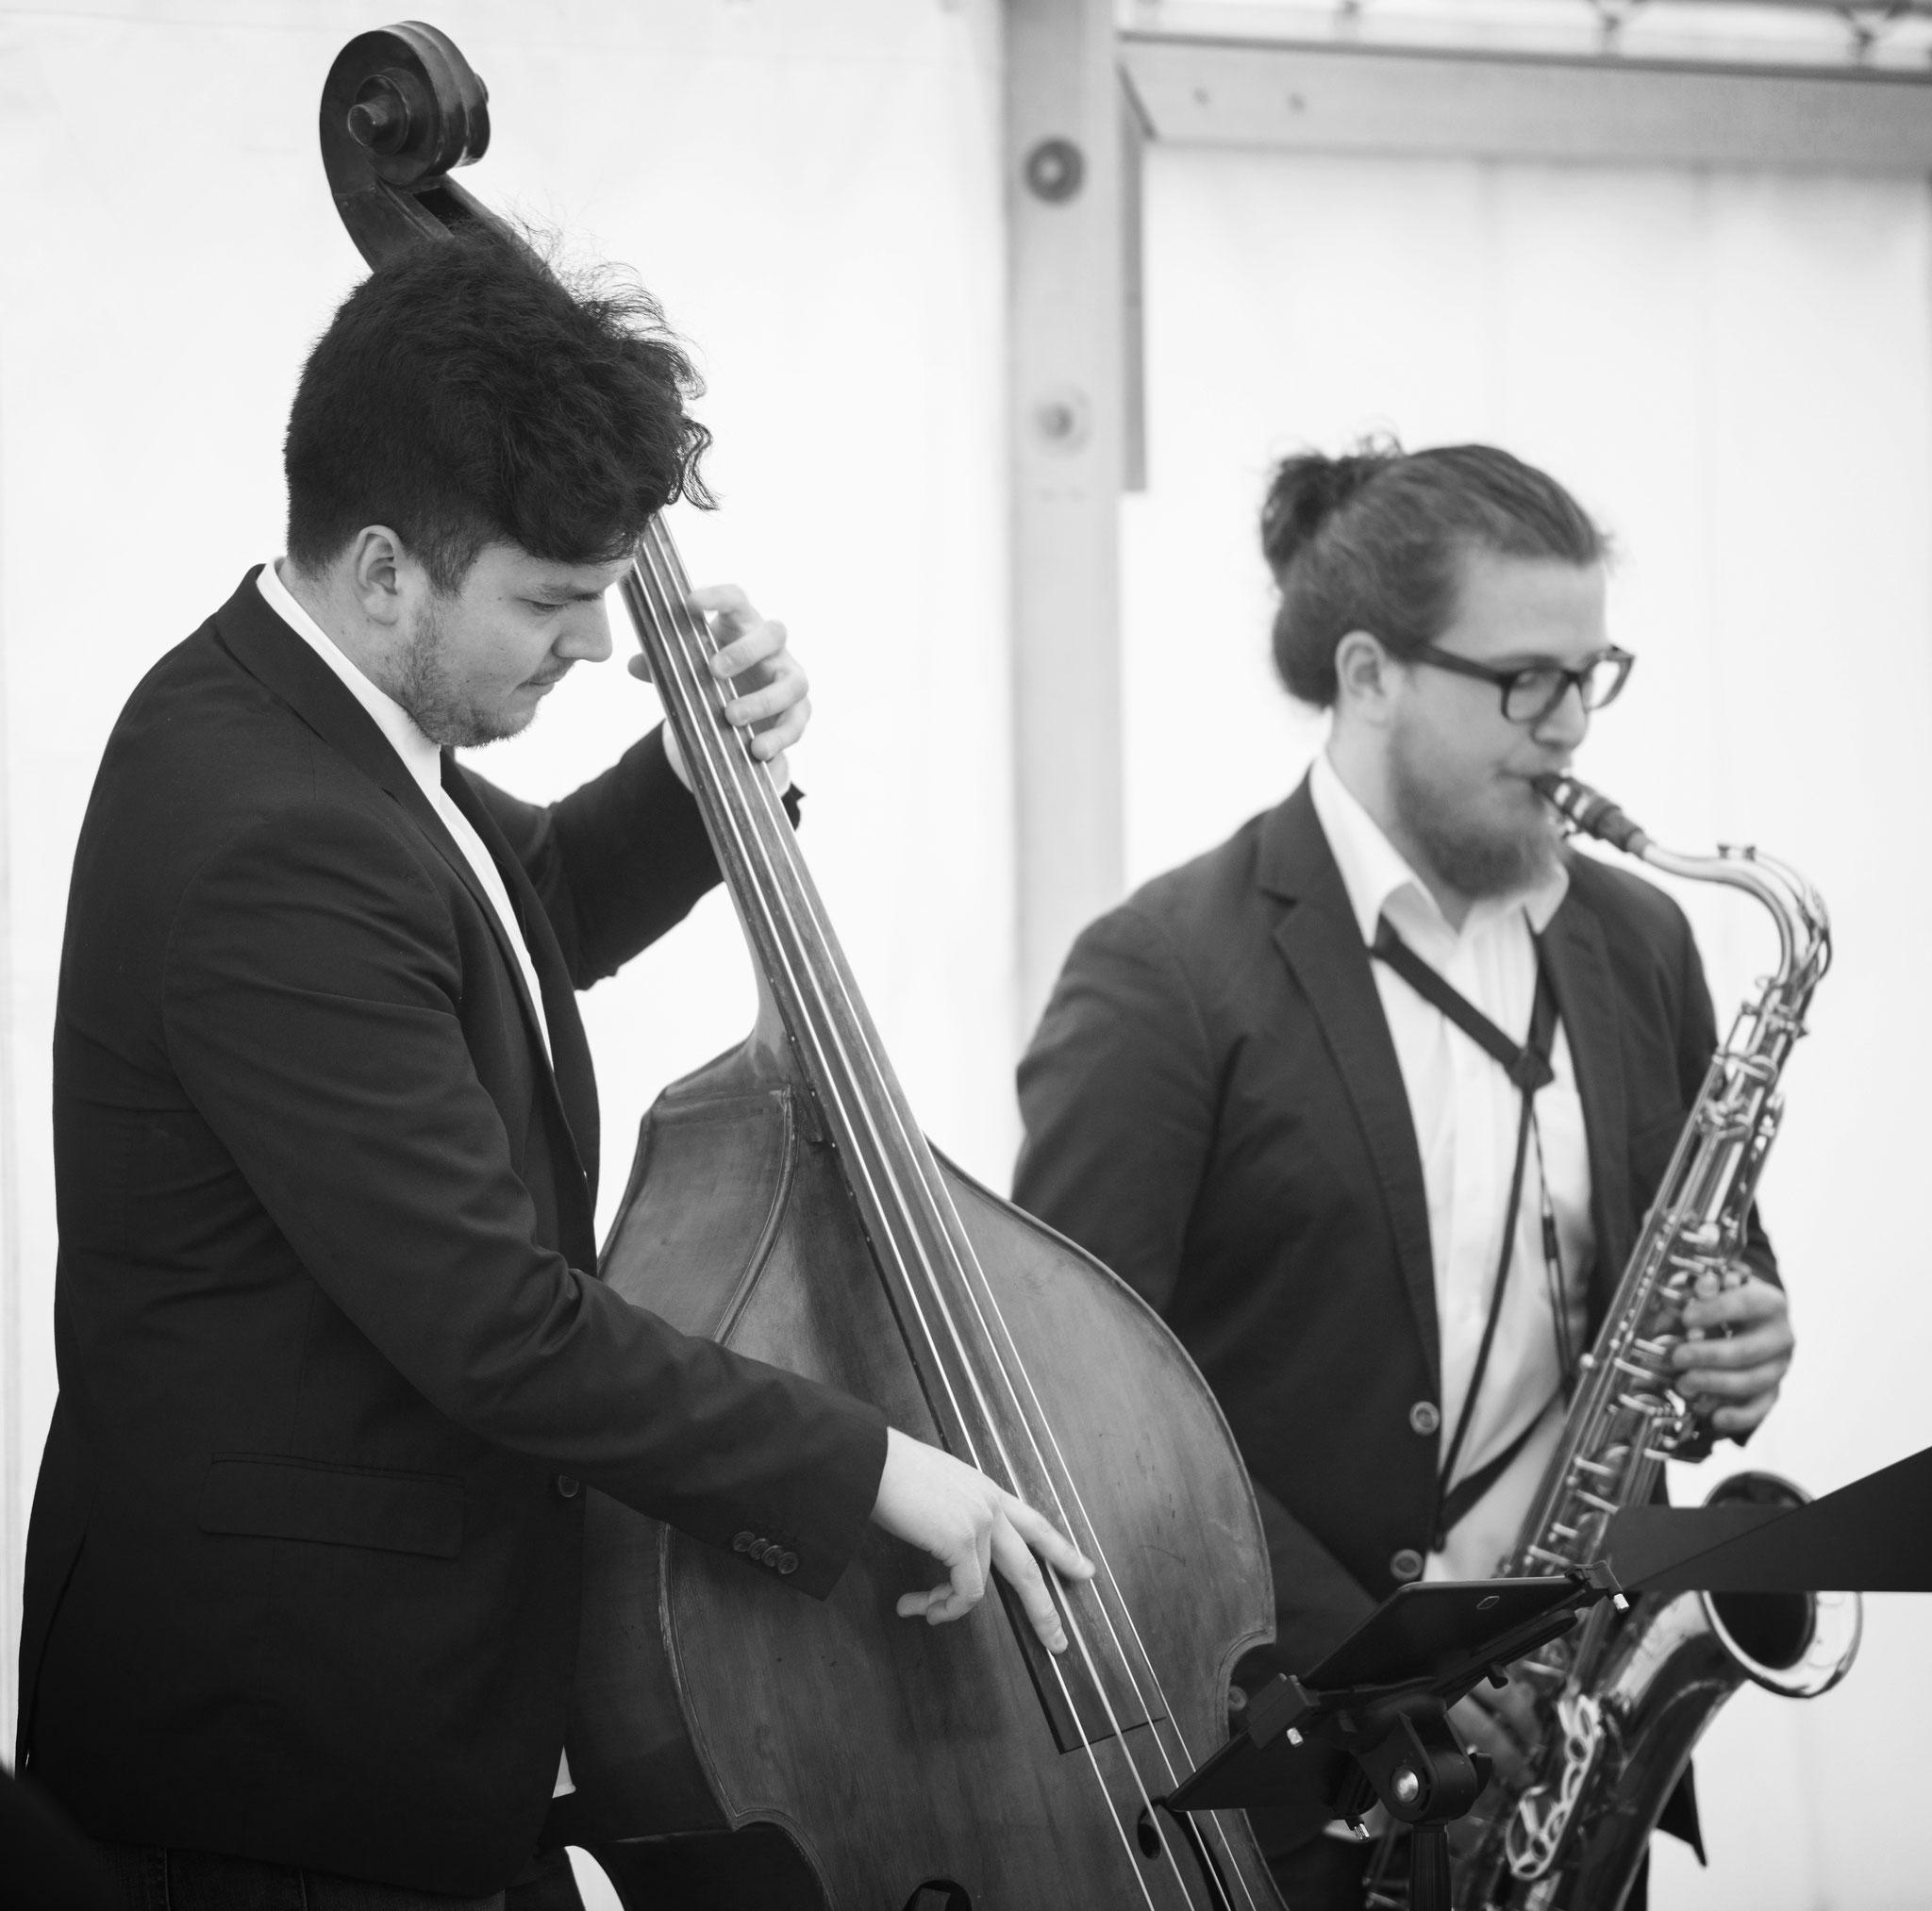 Sax & Bass